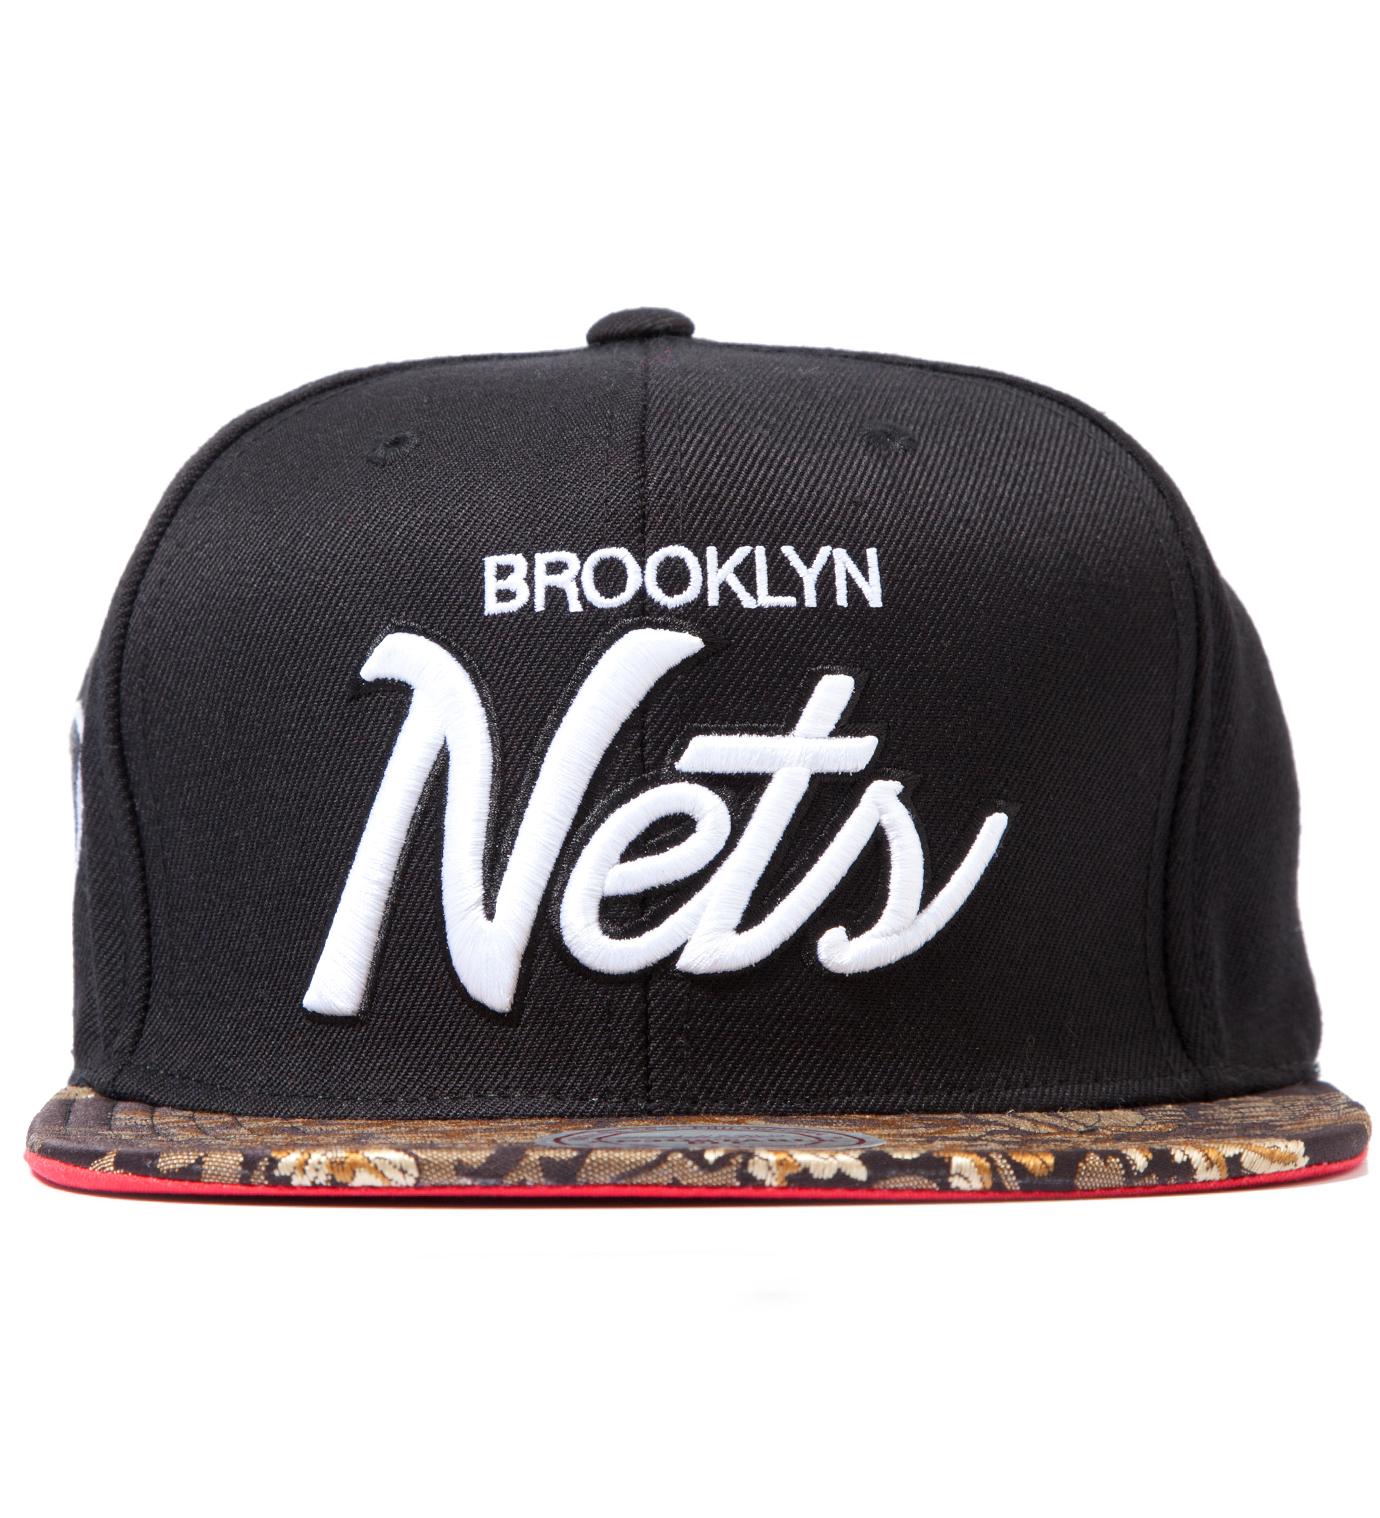 The Genesis Project Brooklyn Nets Script Floral Strap-Back Cap